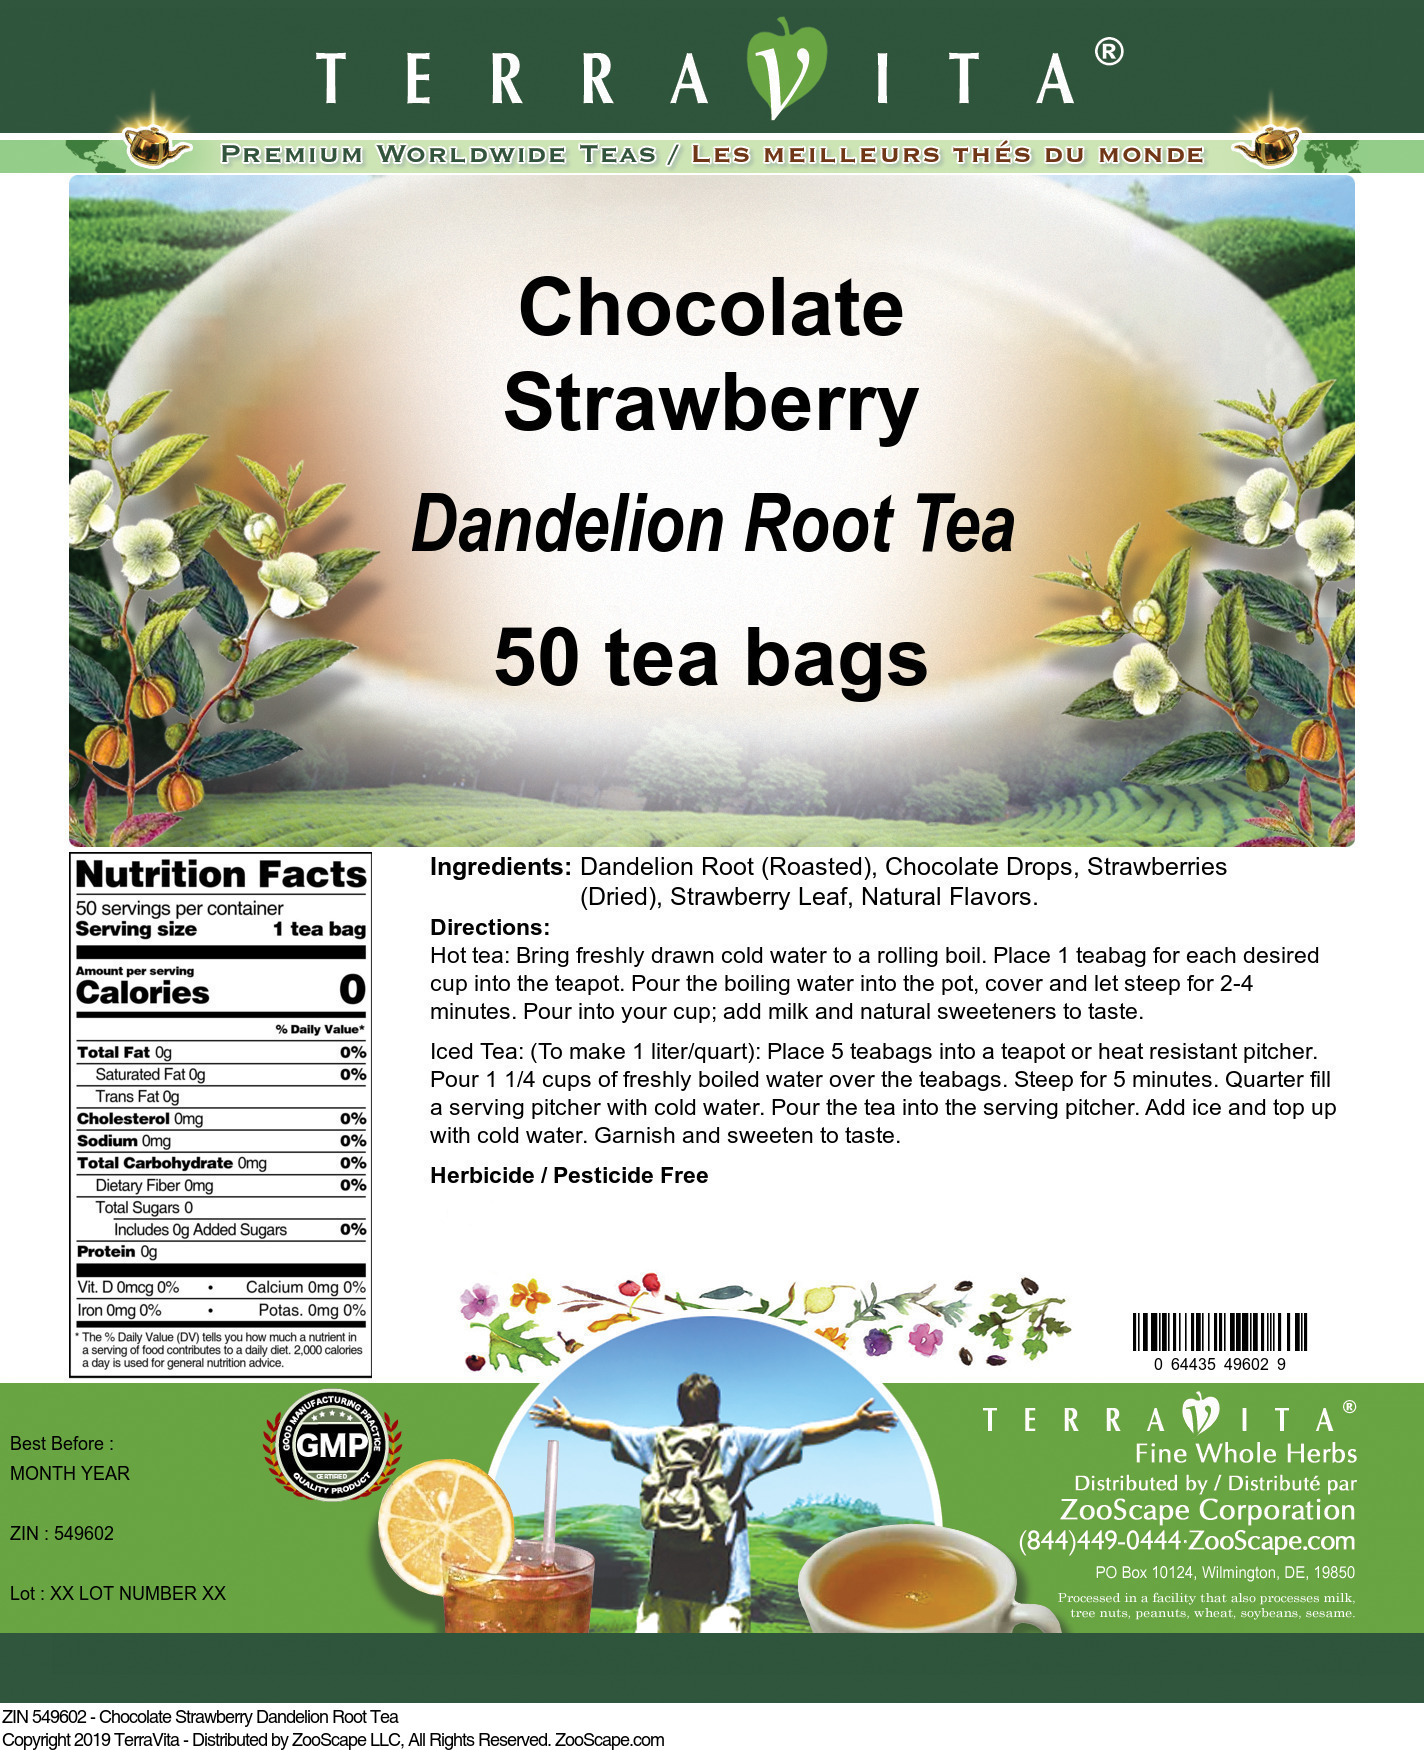 Chocolate Strawberry Dandelion Root